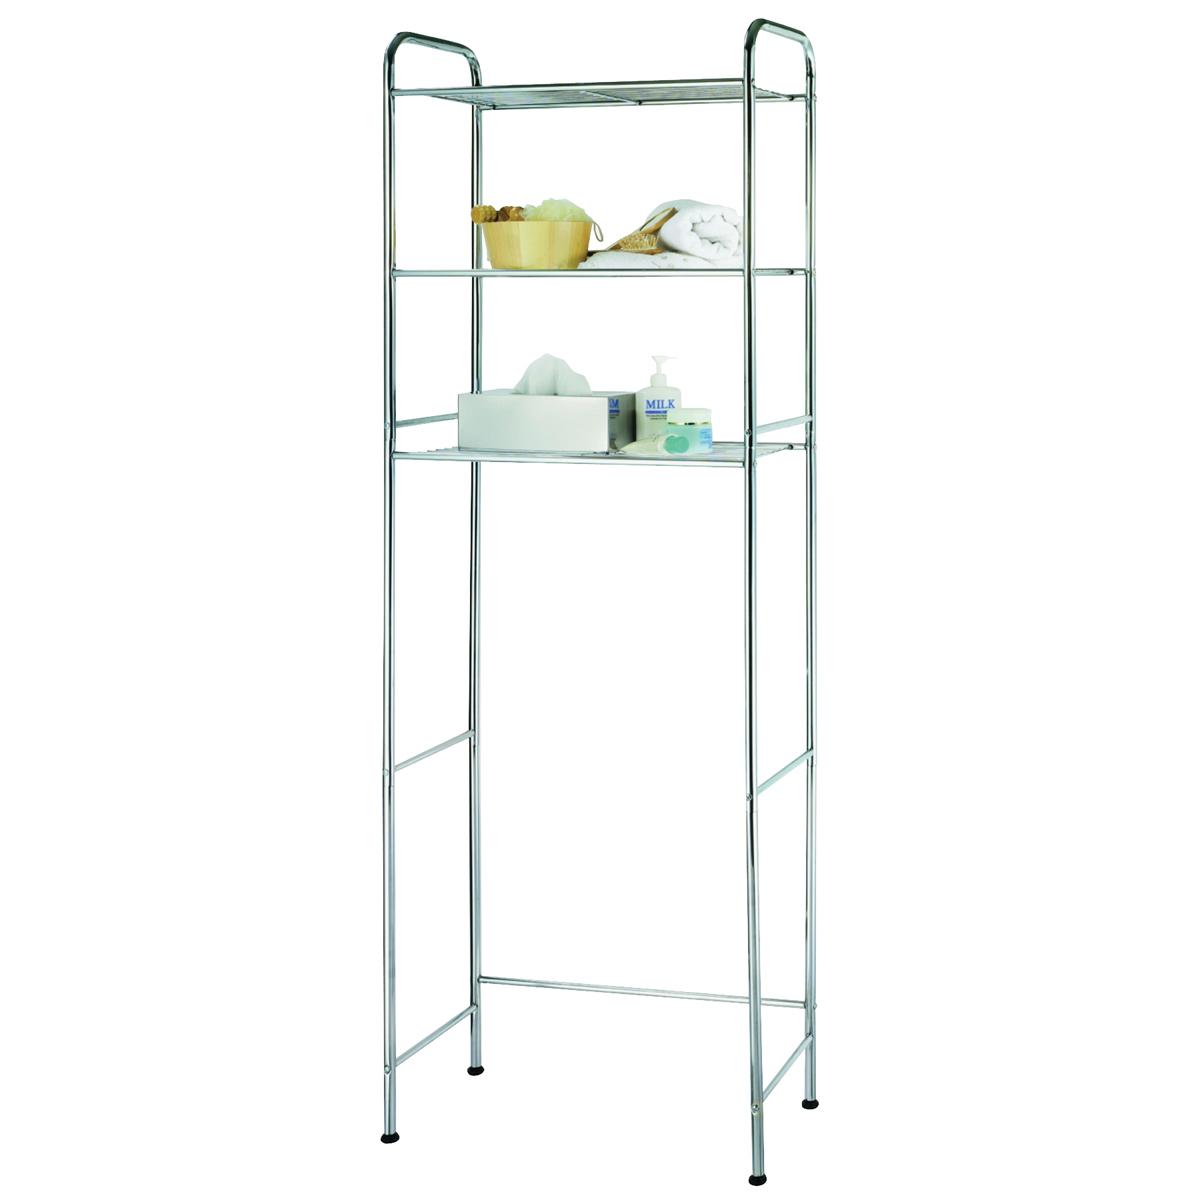 Picture of Simple Spaces TS16C0-CH Bath Shelf, Each shelf 15 lb Max Weight Capacity, 3-Shelf, Steel, Polished Chrome